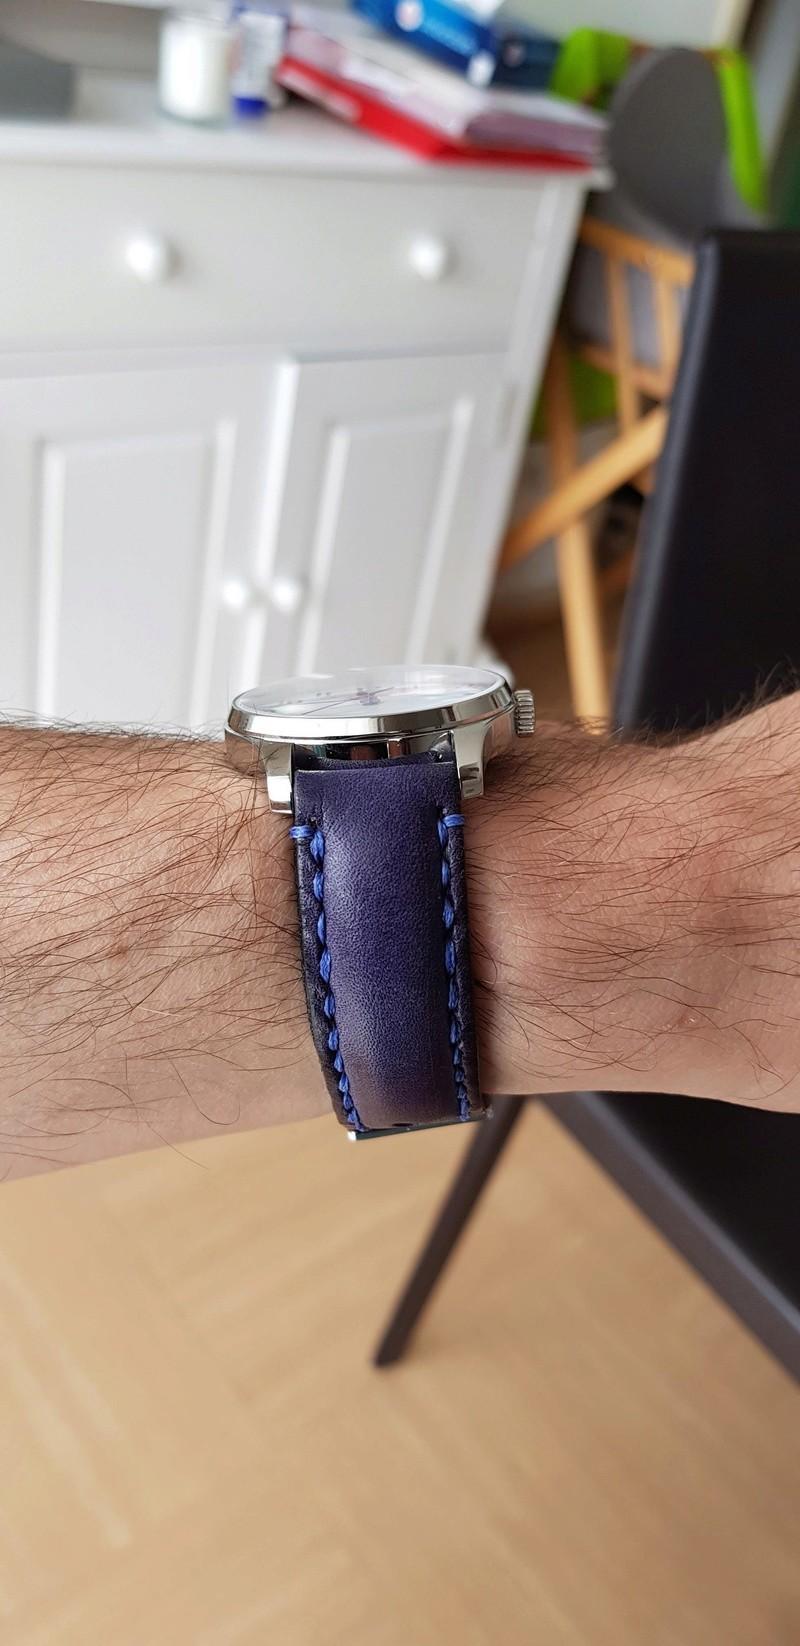 stowa - Présentation de ma montre de mariage - Stowa Stowa710